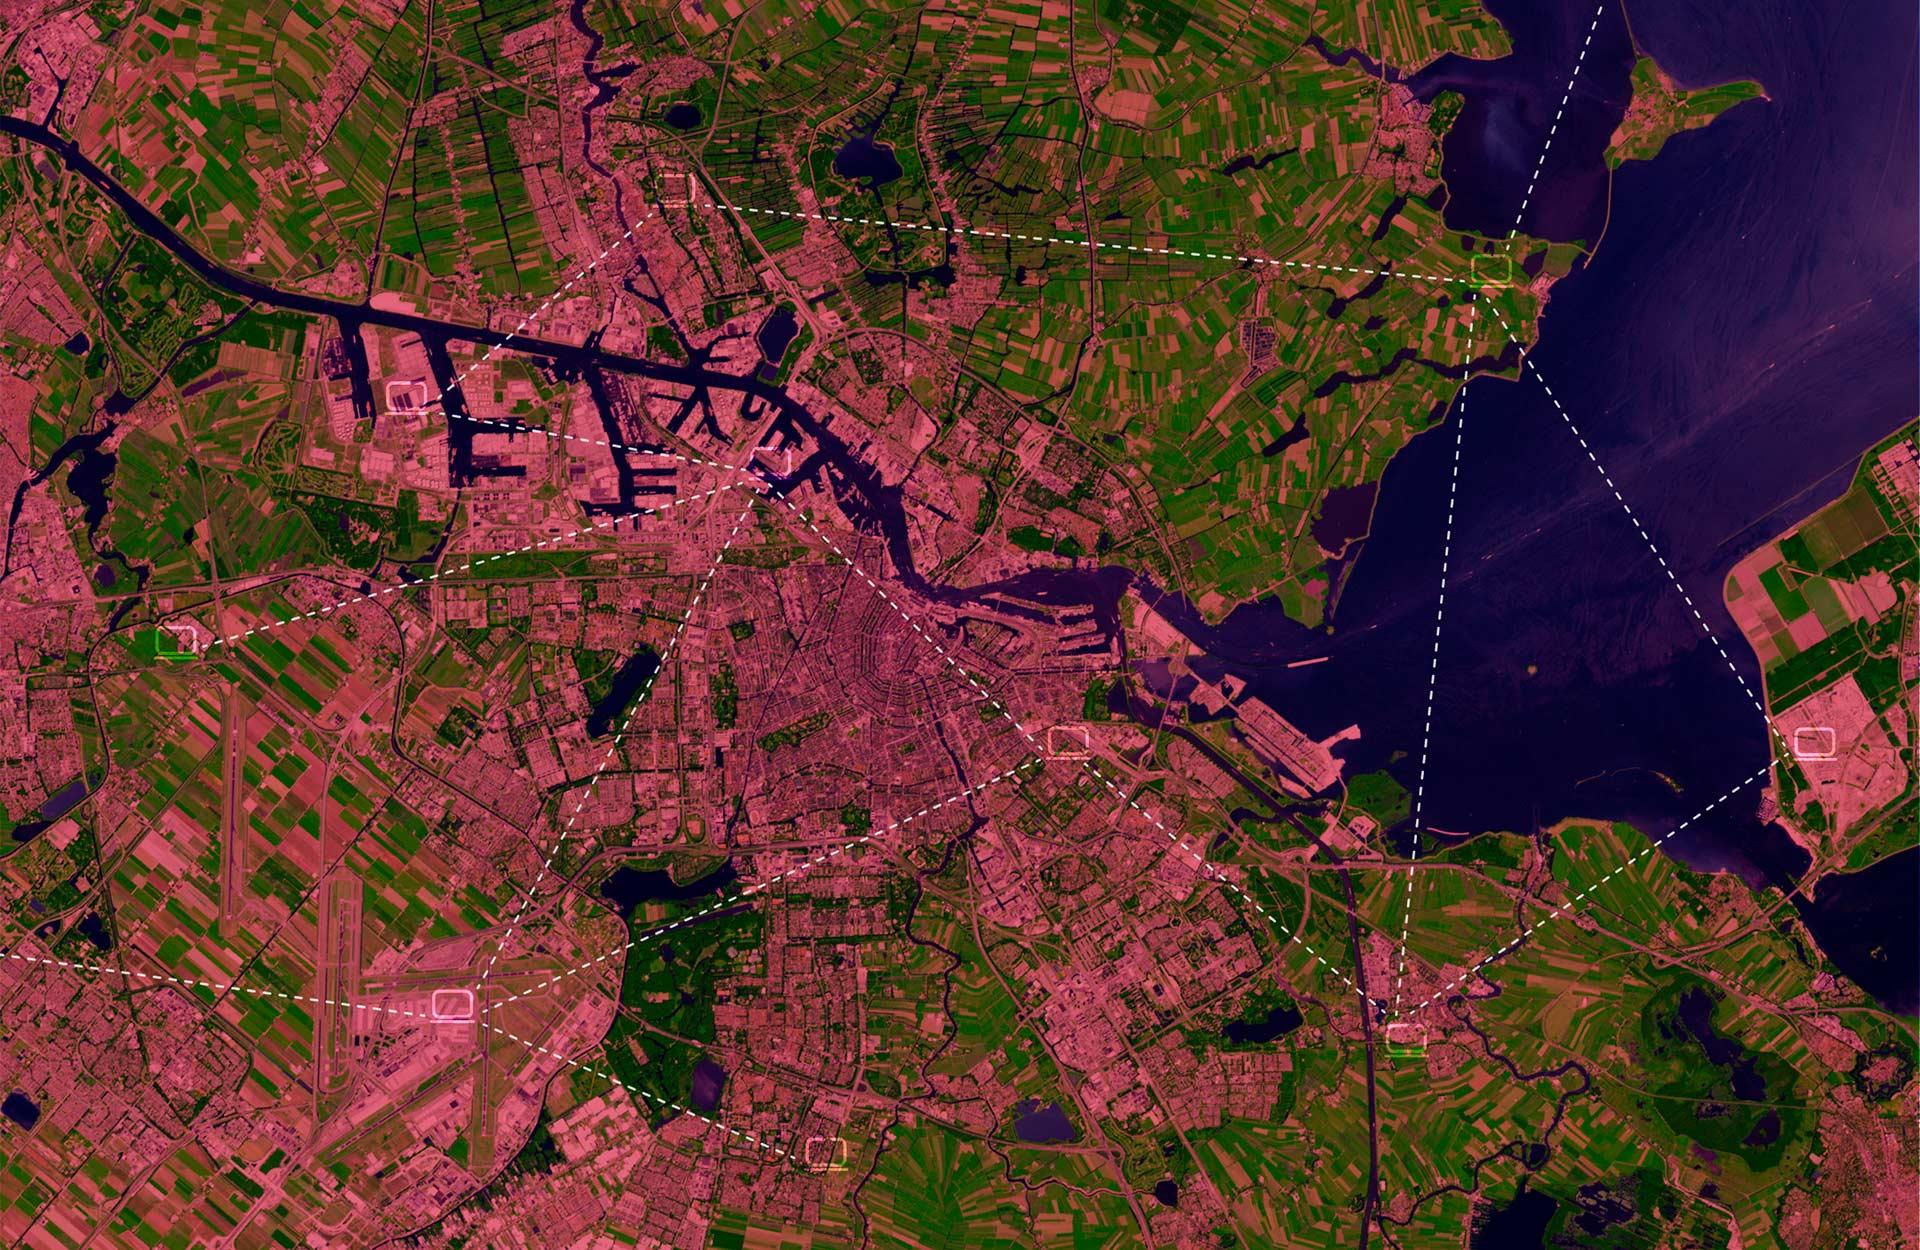 Satellite view of Amsterdam